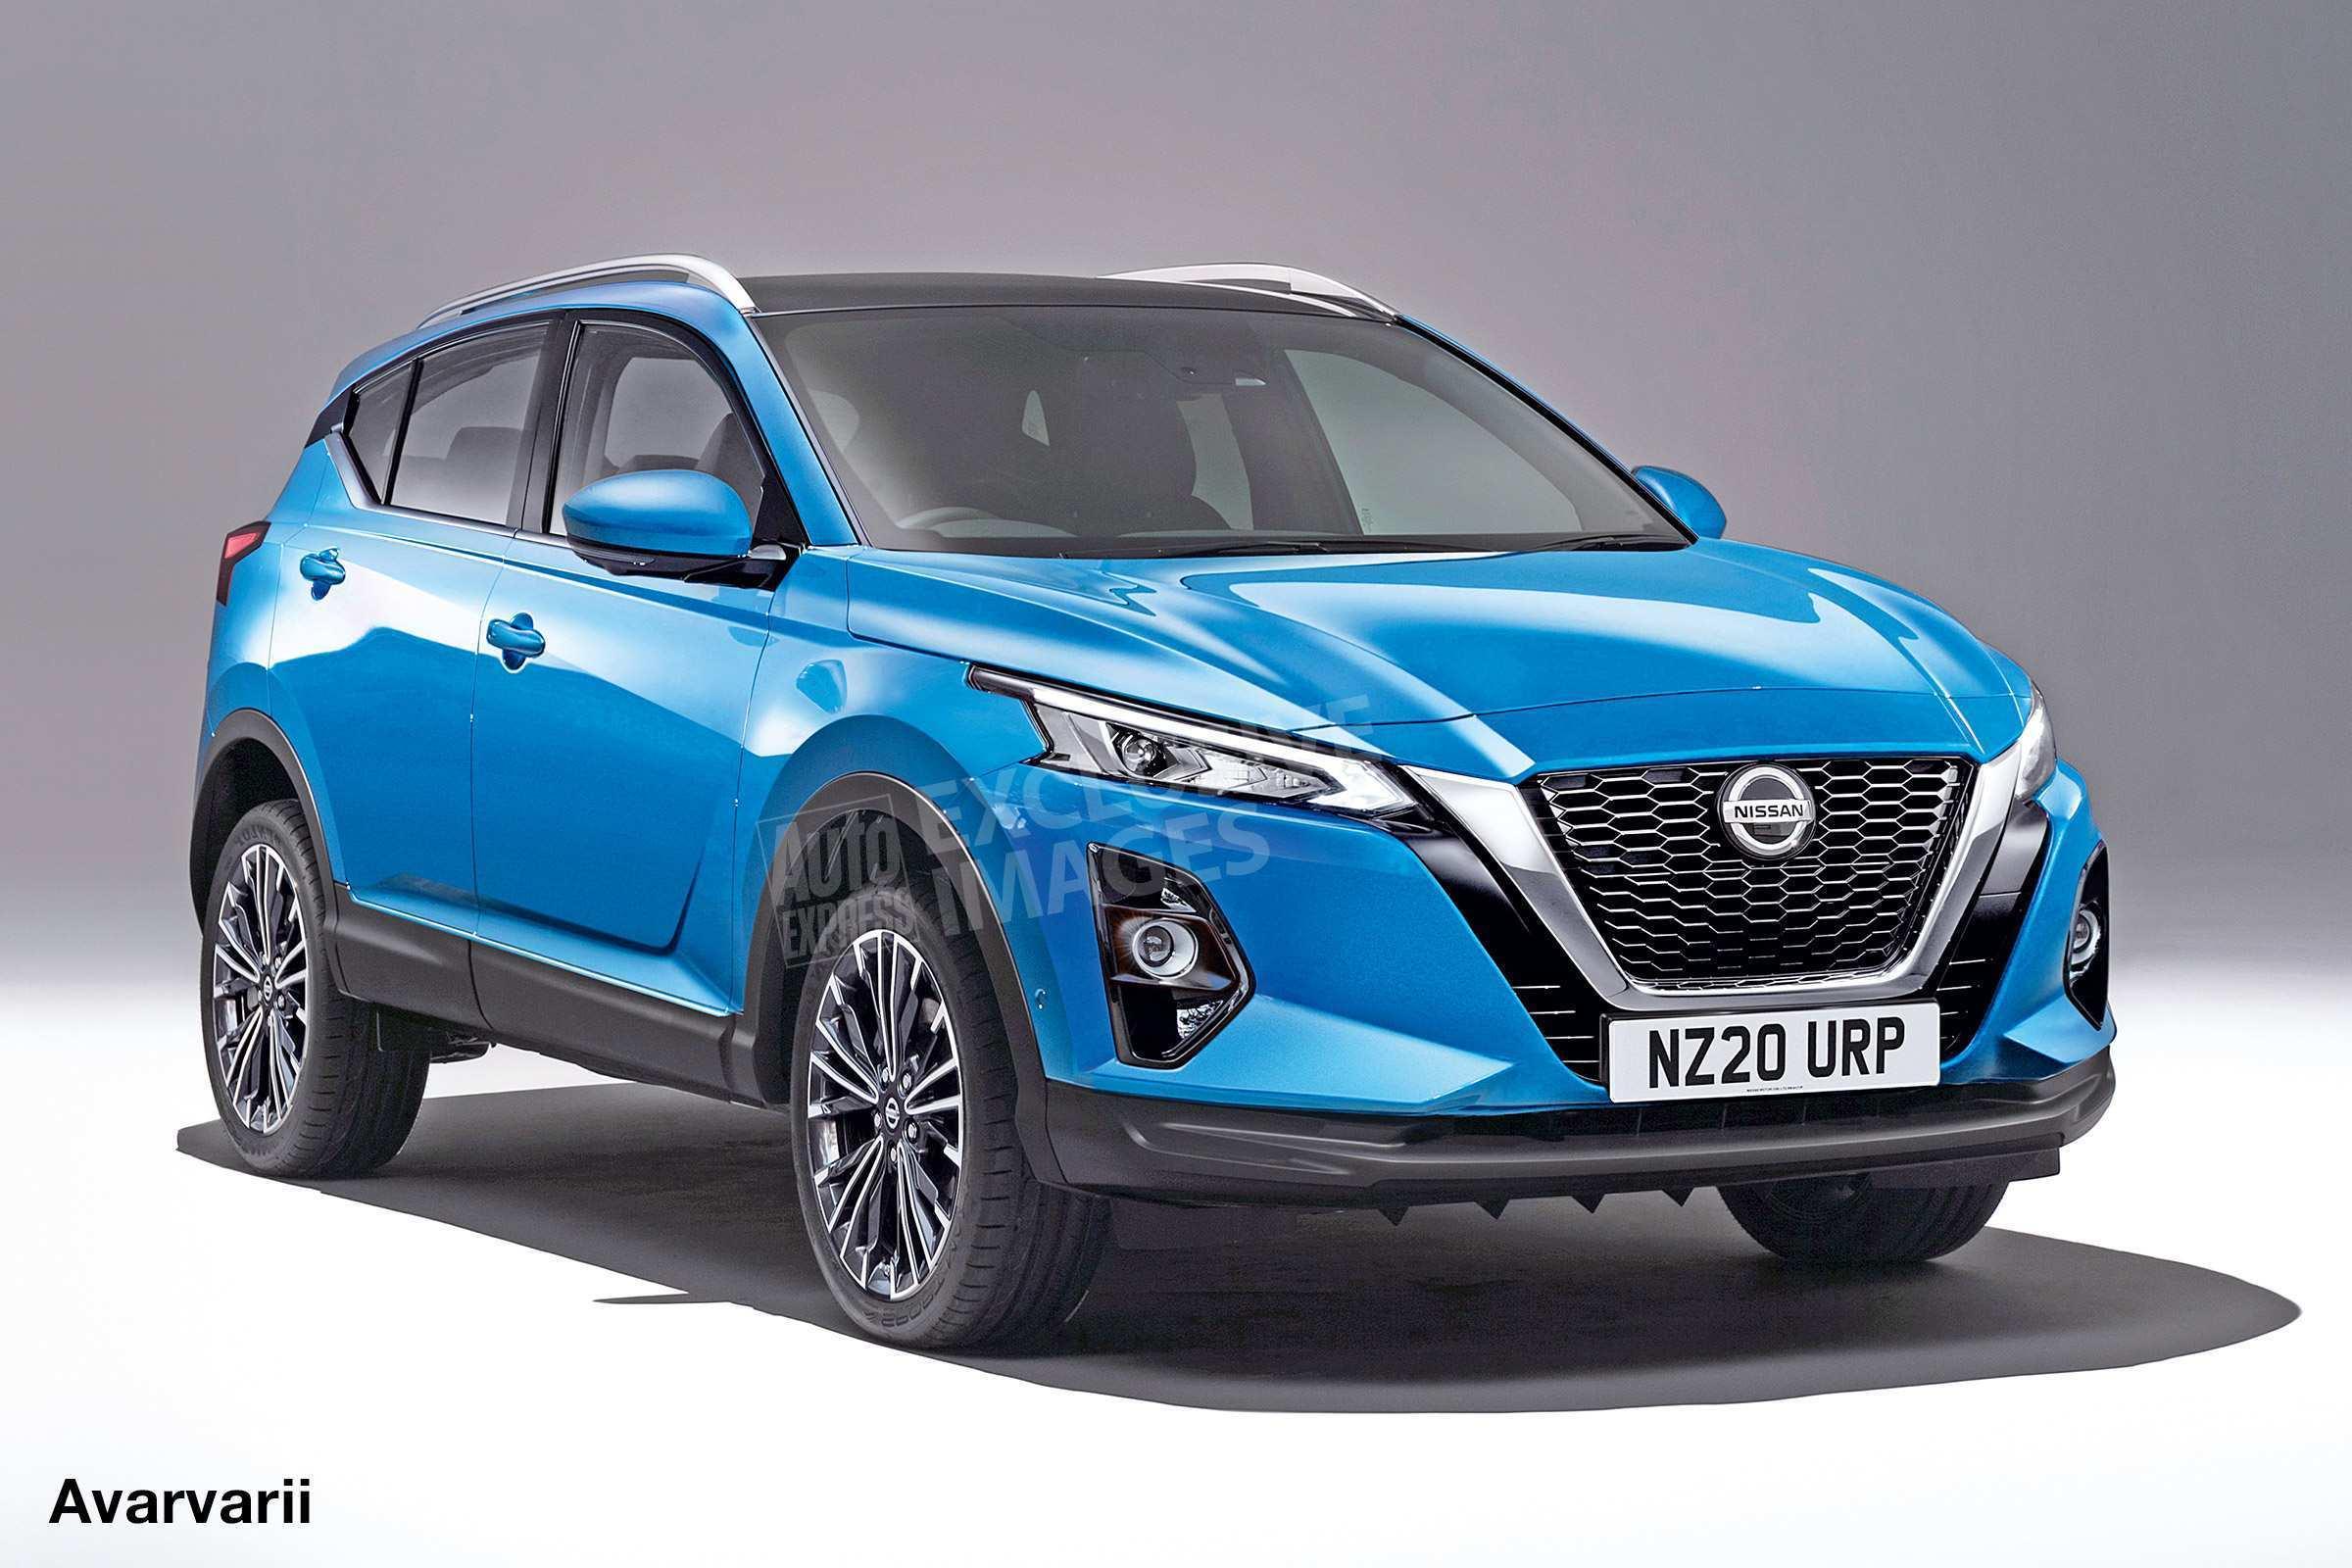 64 Concept of 2020 Nissan Qashqai 2018 Specs for 2020 Nissan Qashqai 2018